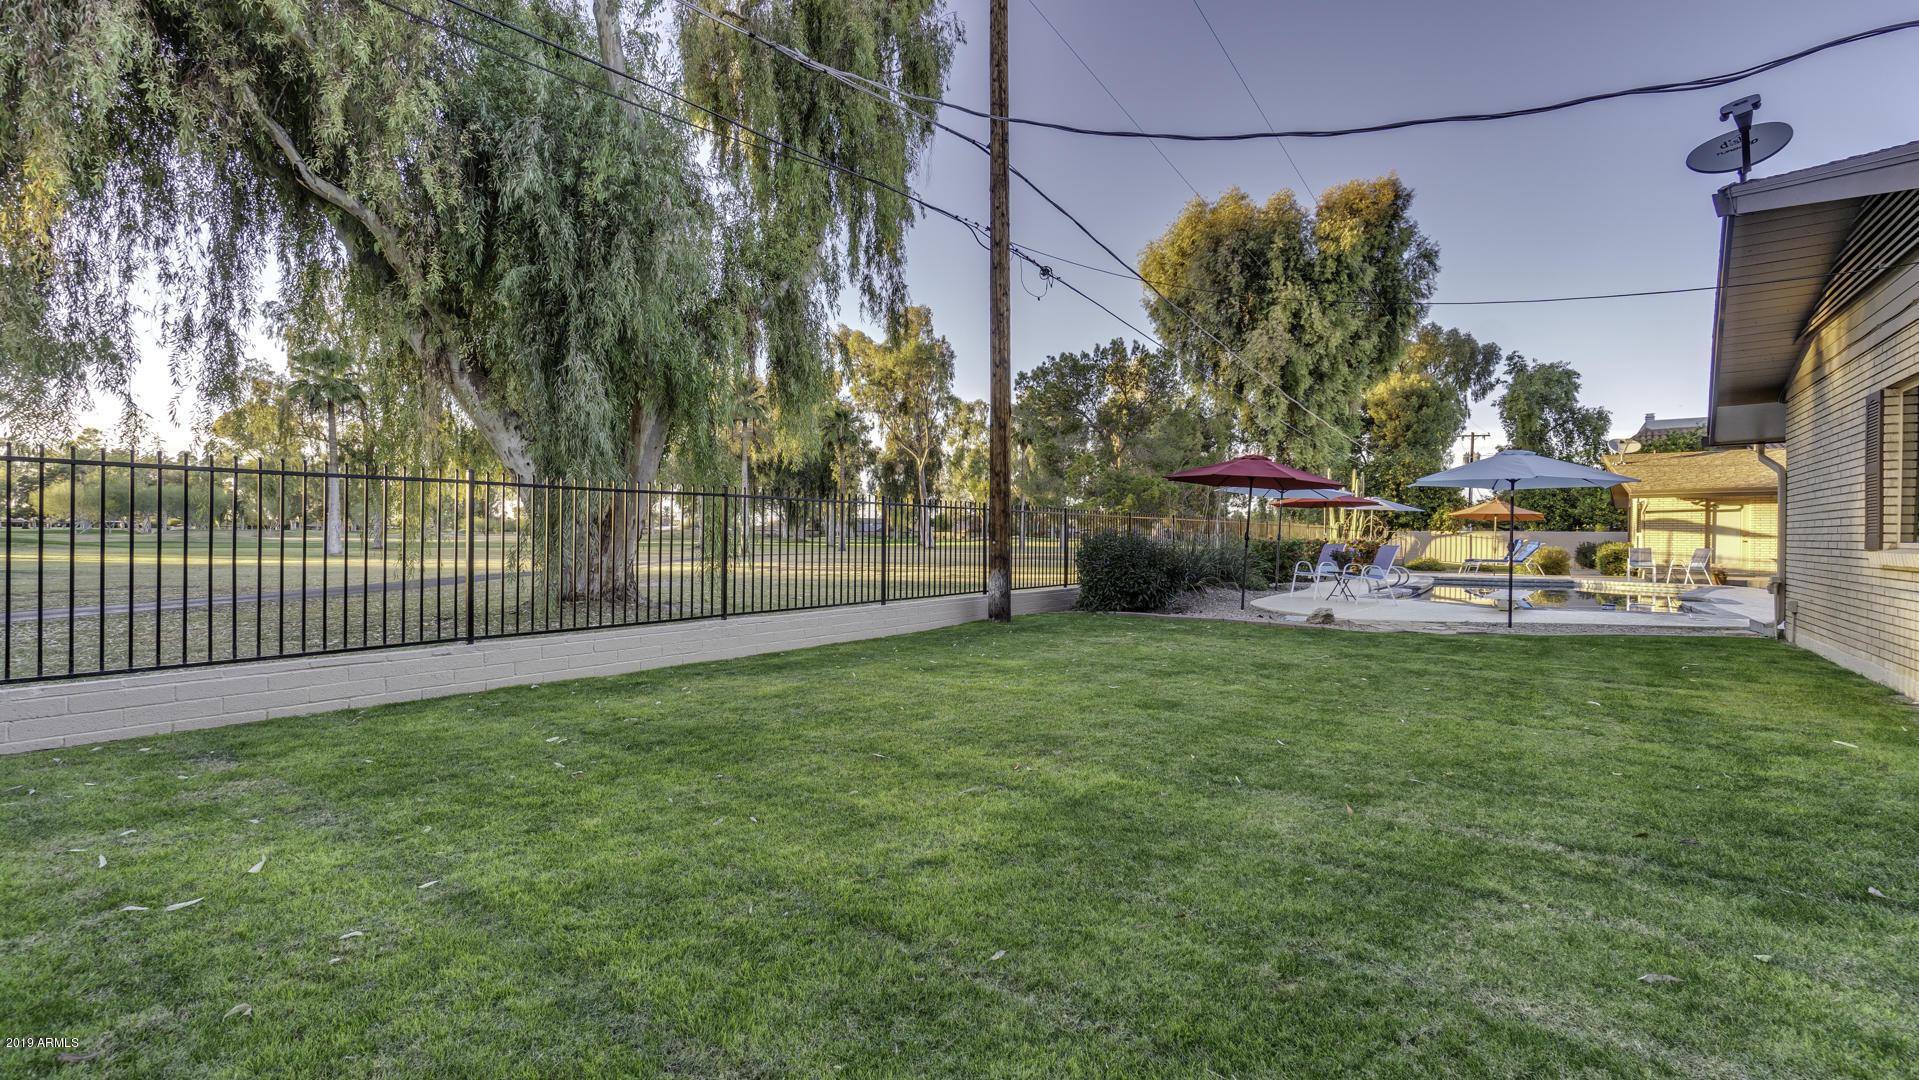 MLS 5862699 1510 N BEL AIR Drive, Mesa, AZ 85201 Mesa AZ Northwest Mesa